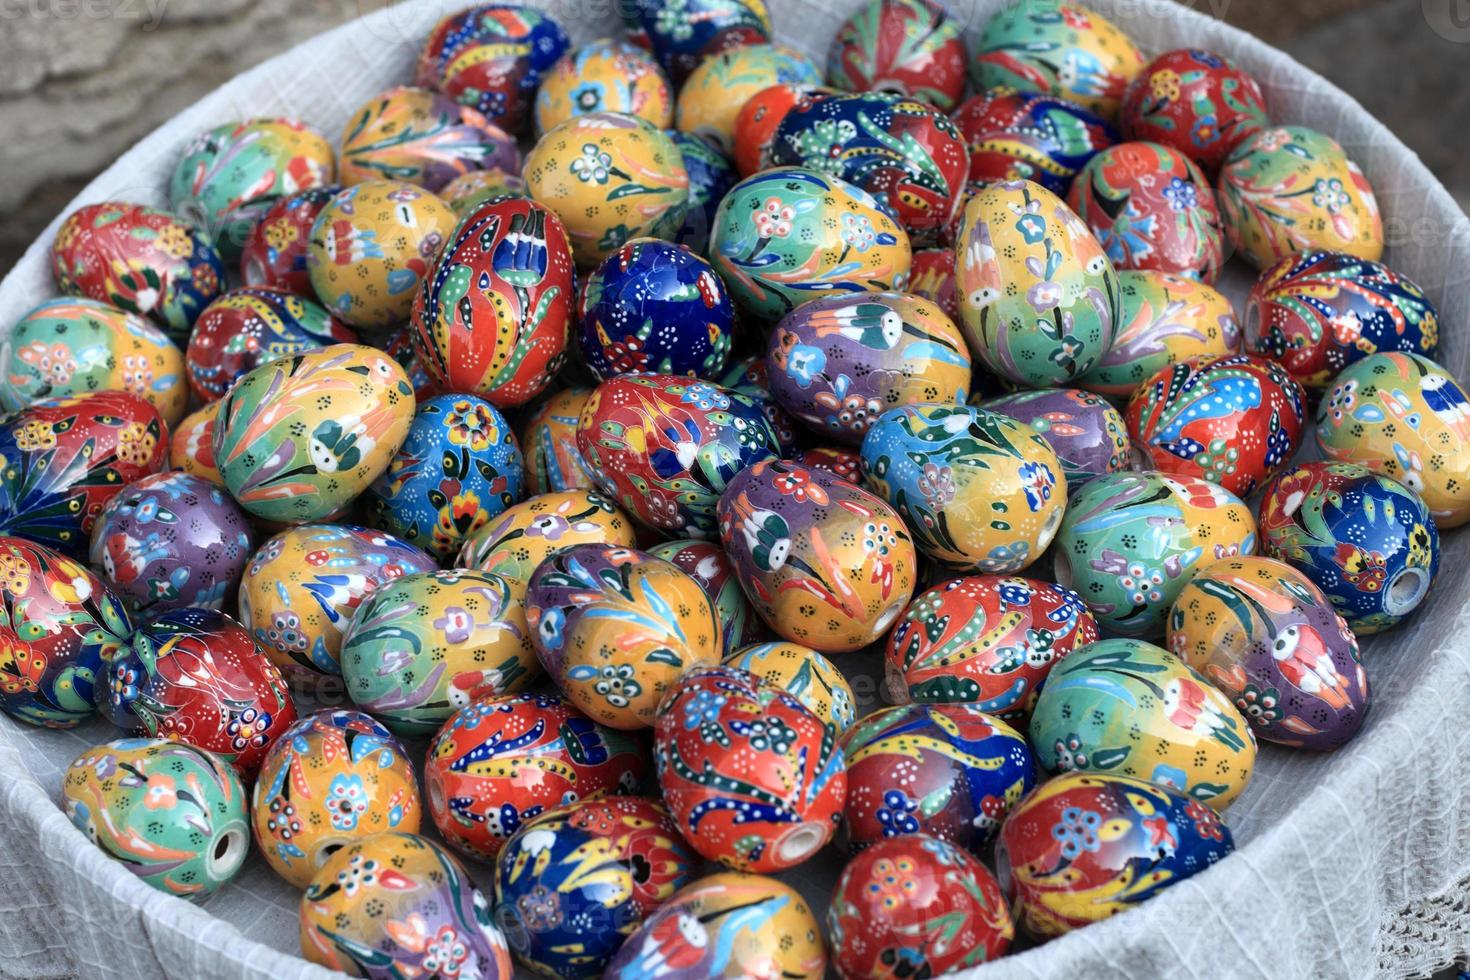 ovos decorativos foto